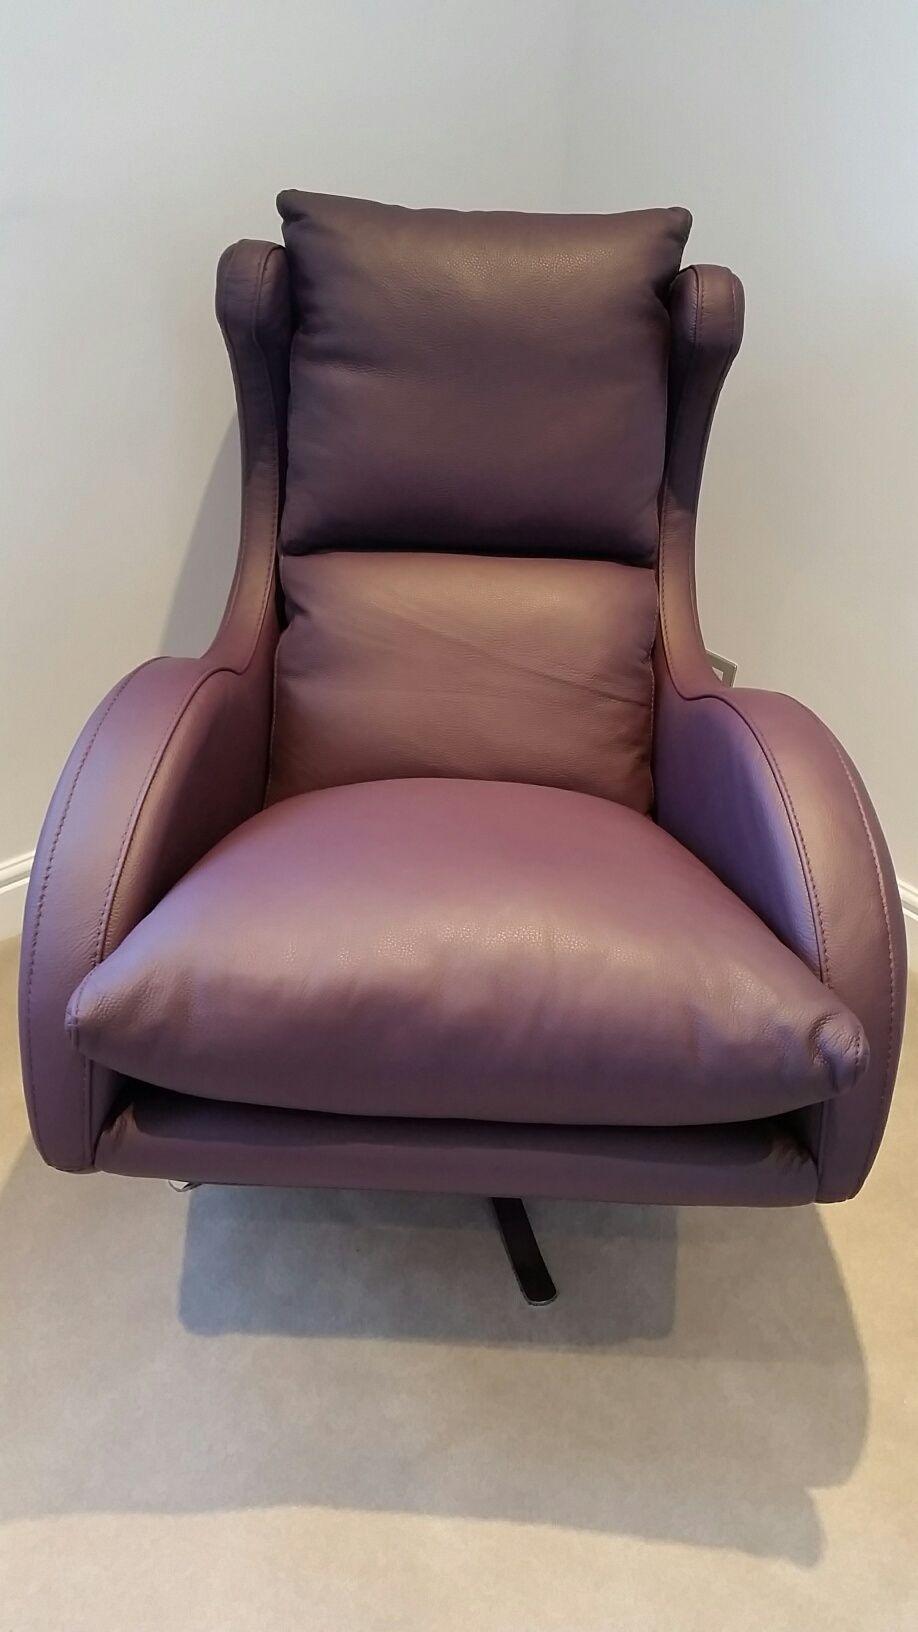 Leather (Cirevo   Berenjena) Contemporary Swivel Armchair.